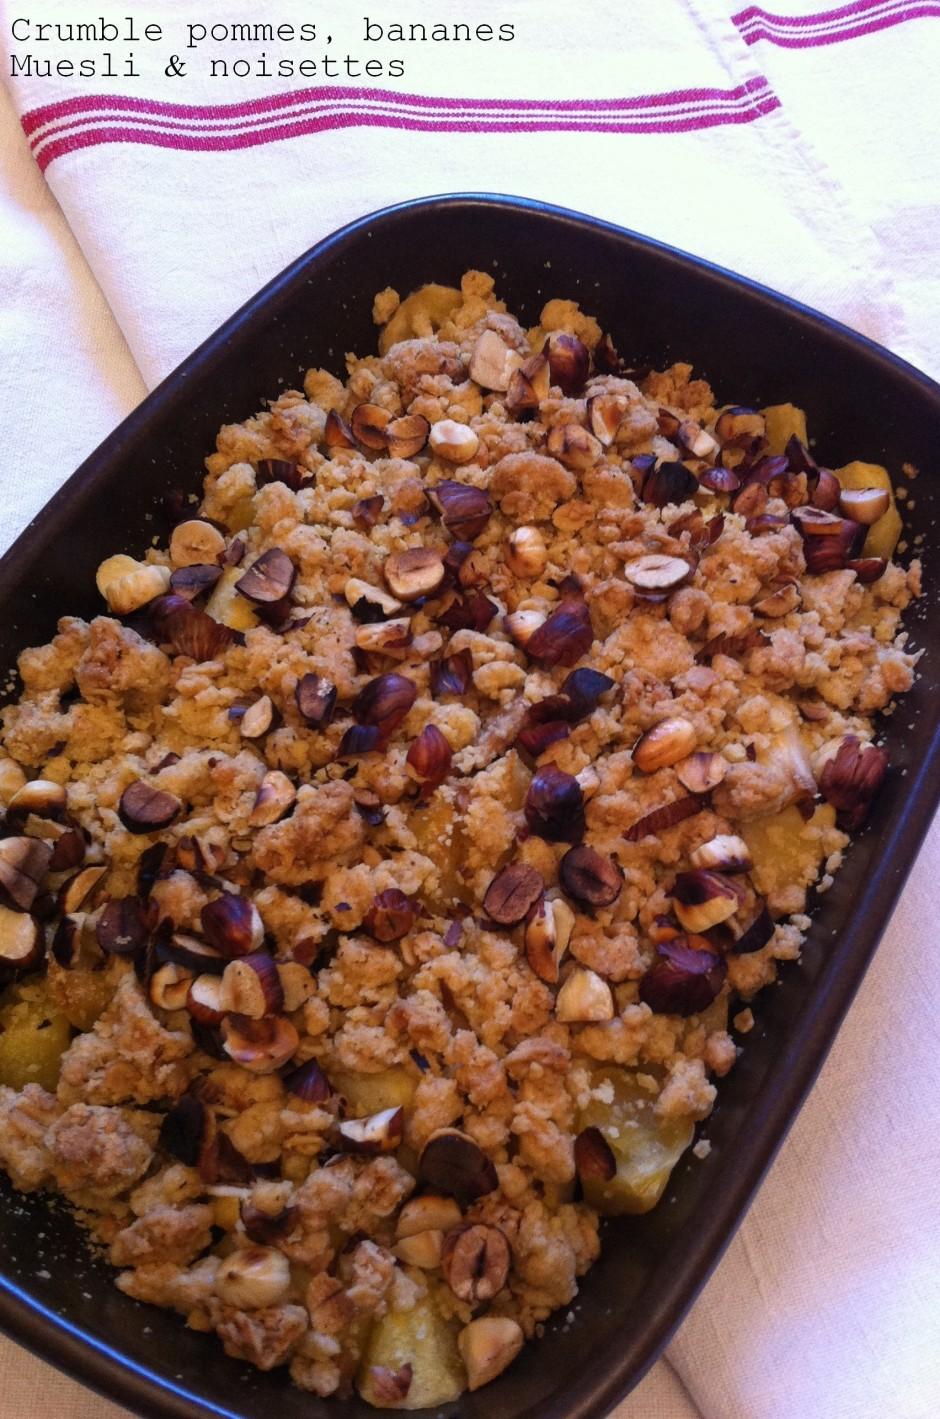 Crumble pommes, bananes-Muesli&noisettes2